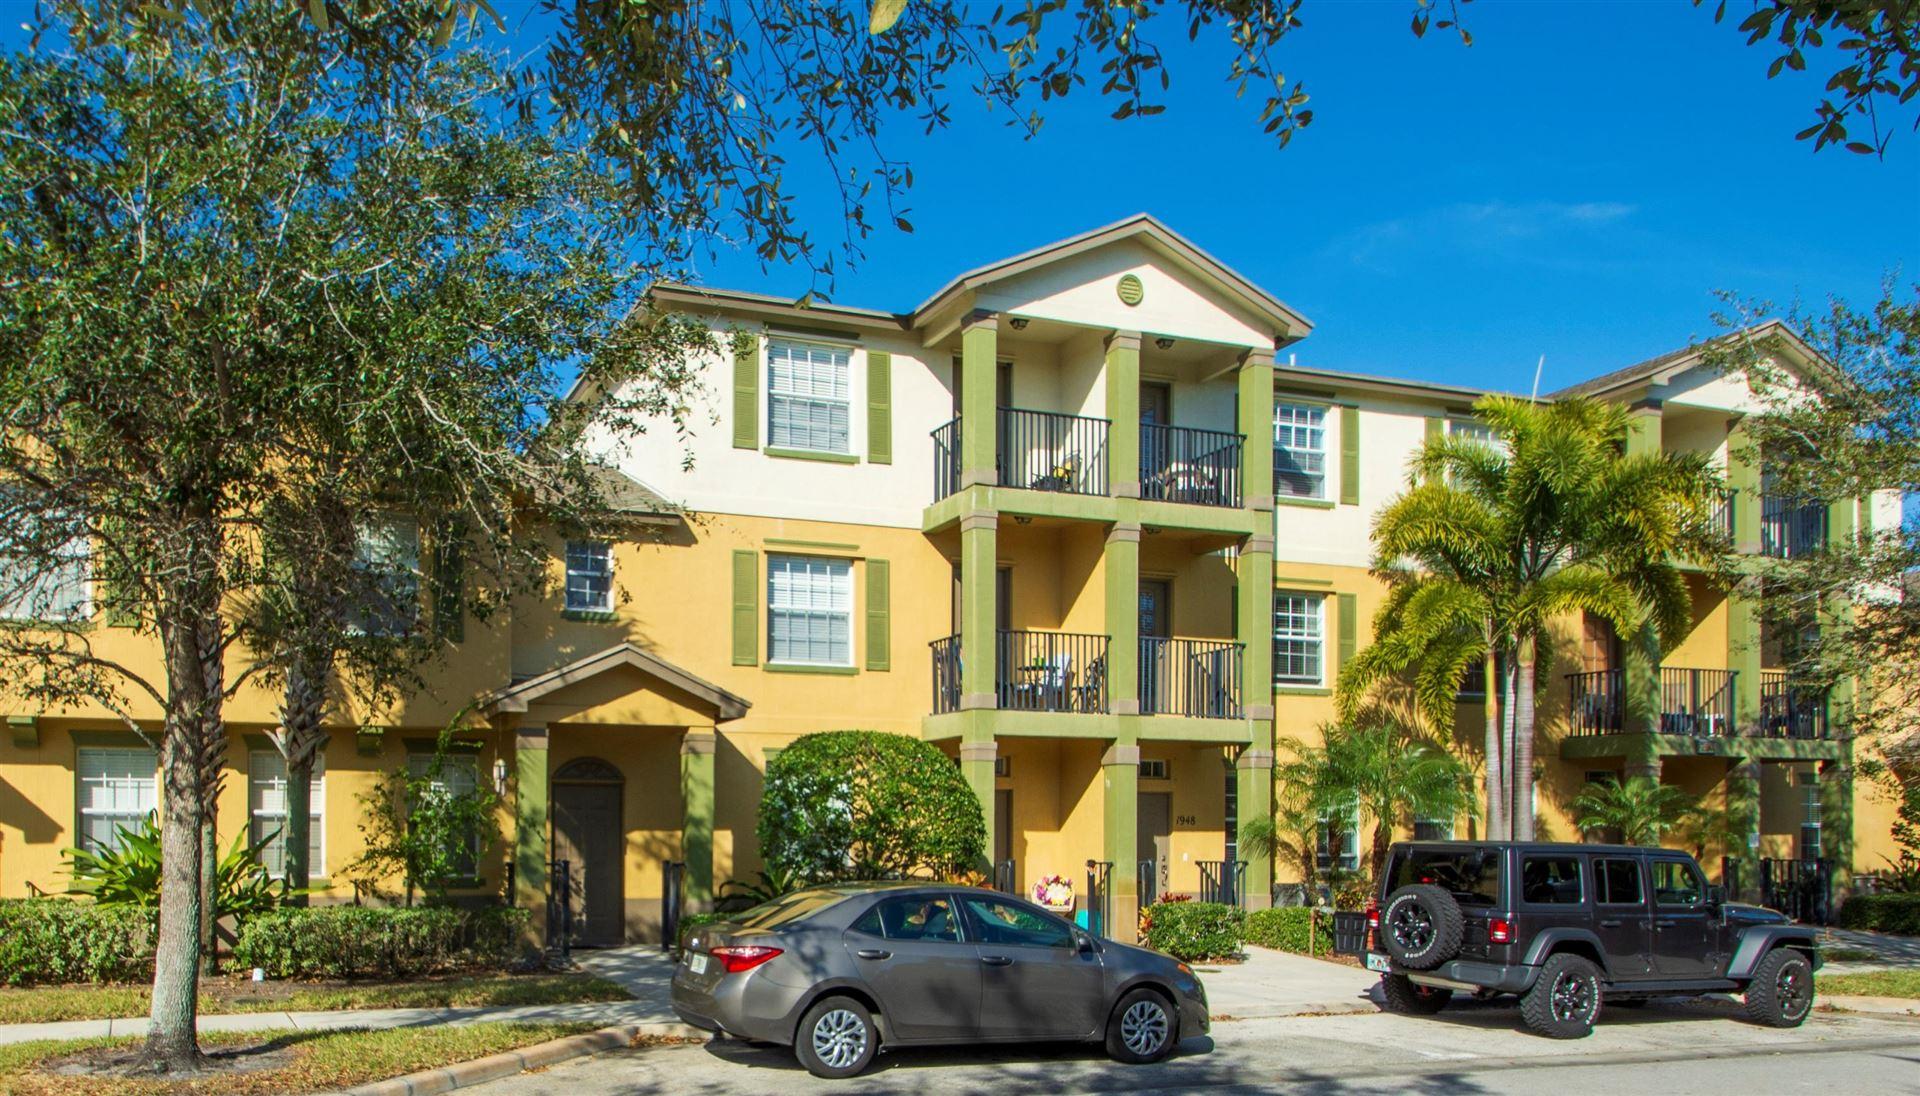 1948 SE High Springs Drive, Port Saint Lucie, FL 34952 - #: RX-10690603